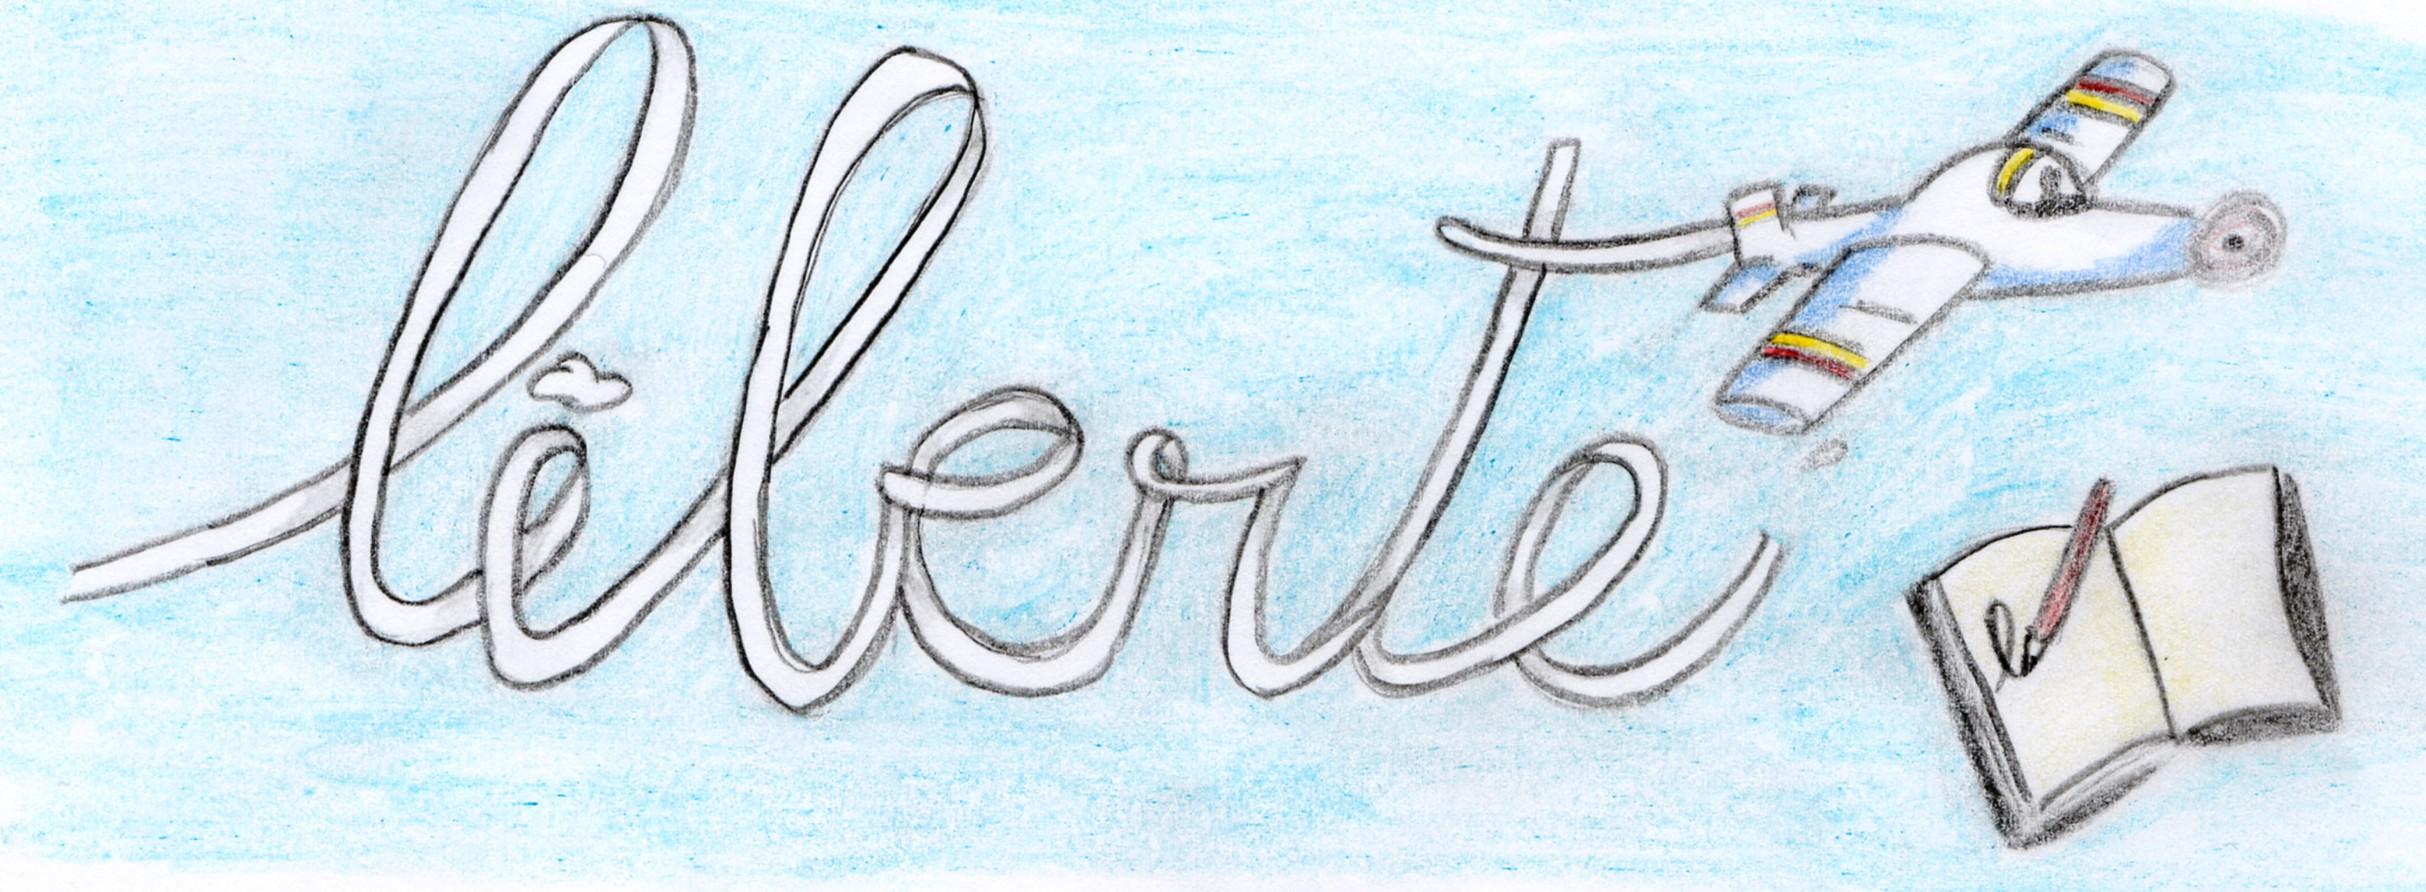 libert2.jpg